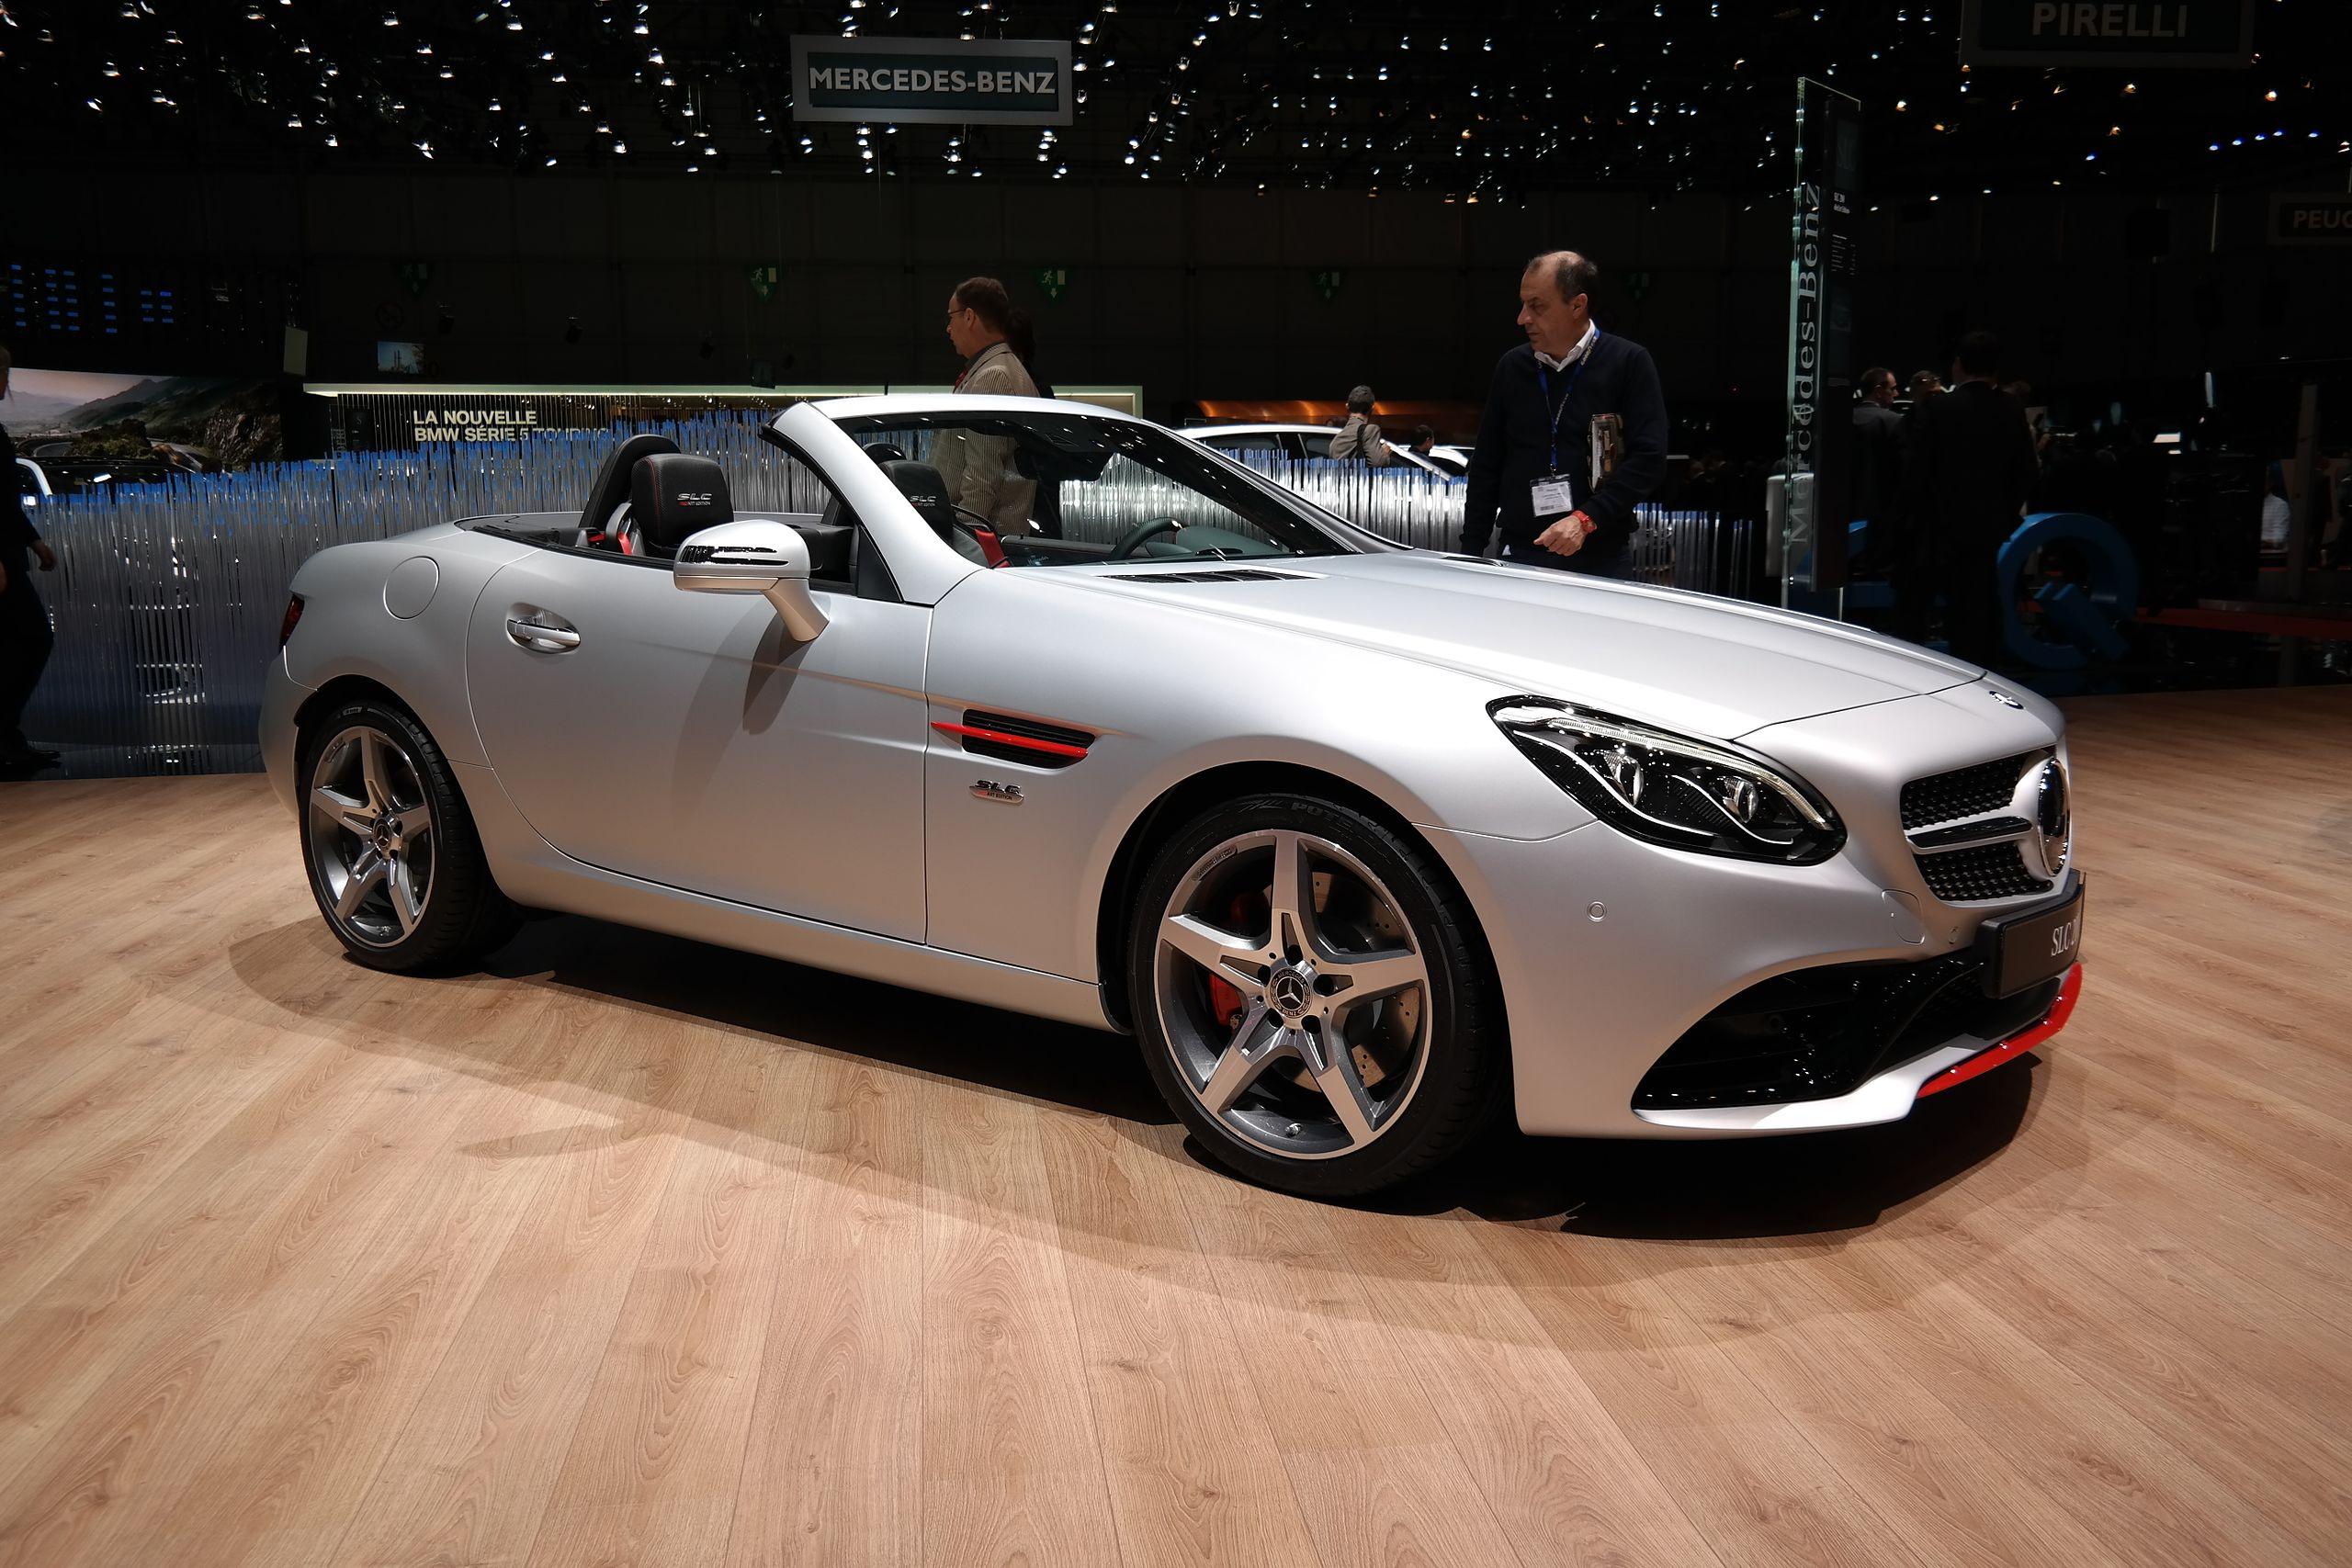 Mercedes SLK Class Window & Windshield Replacement